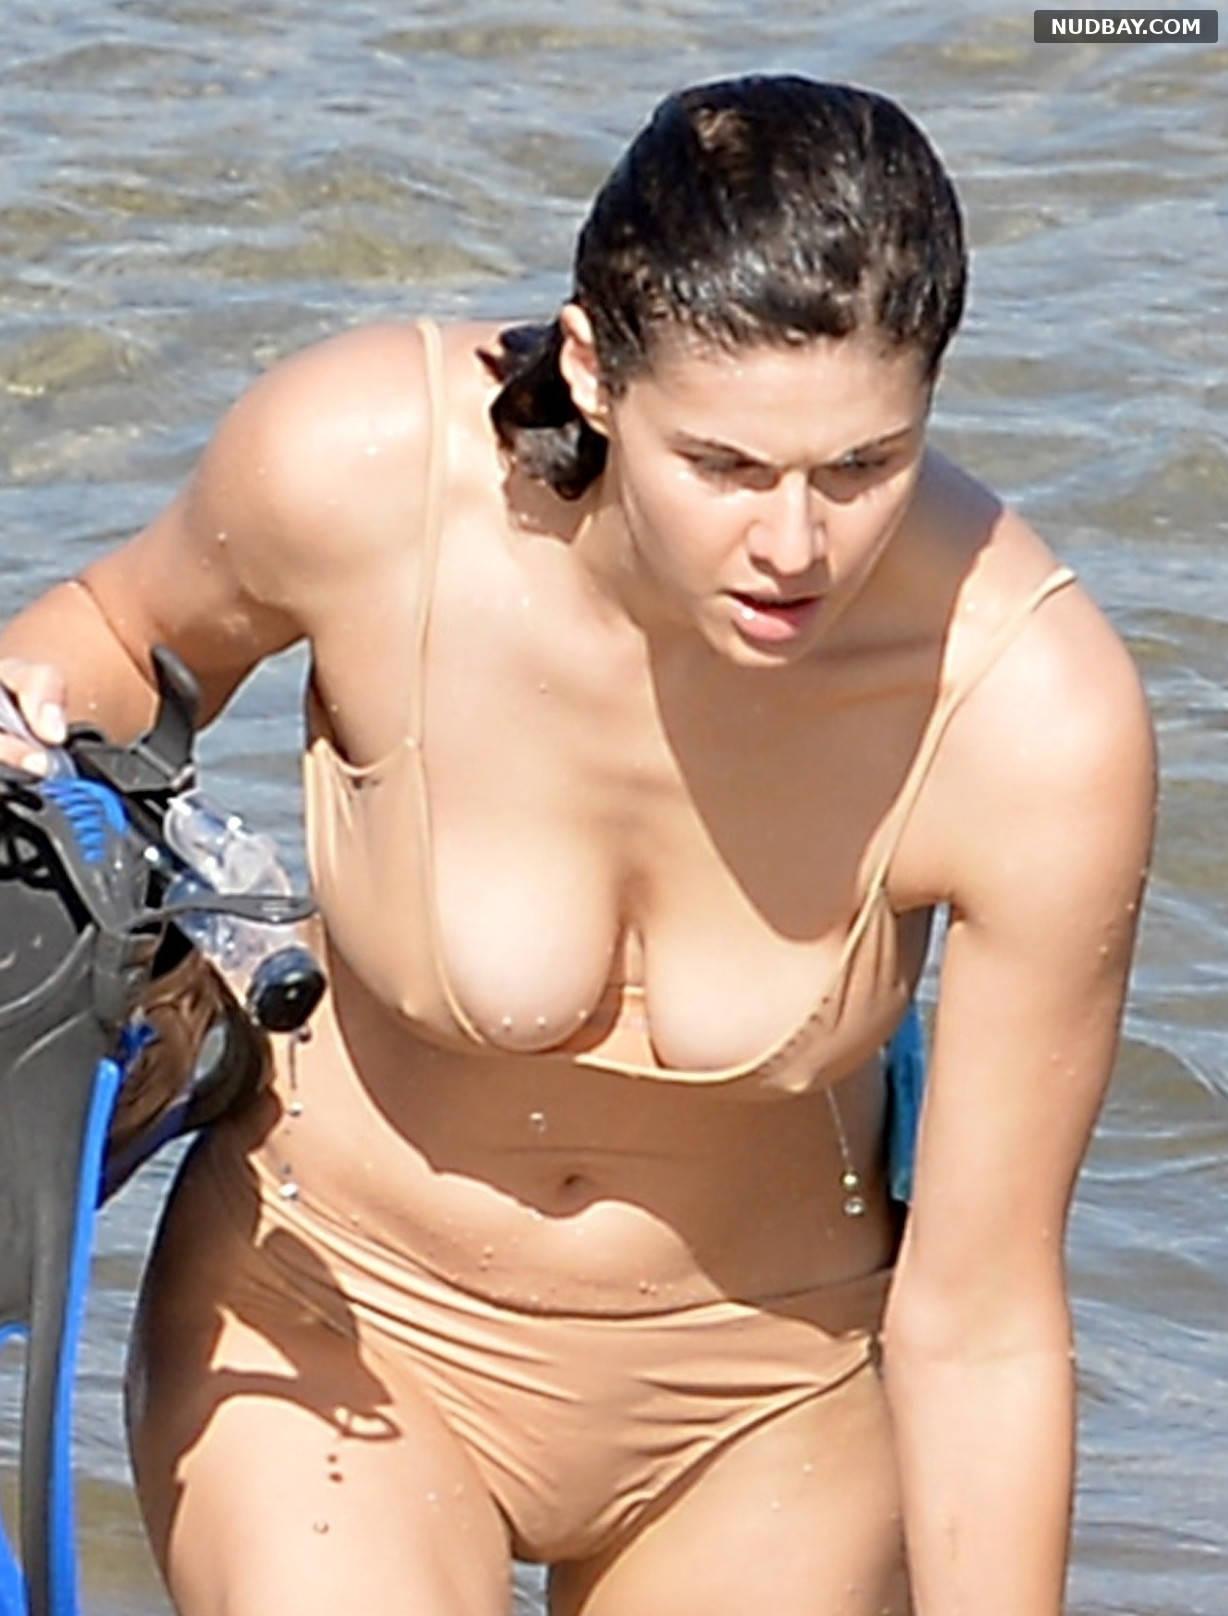 Alexandra Daddario boobs in a bikini on the beach in Maui Nov 26 2020